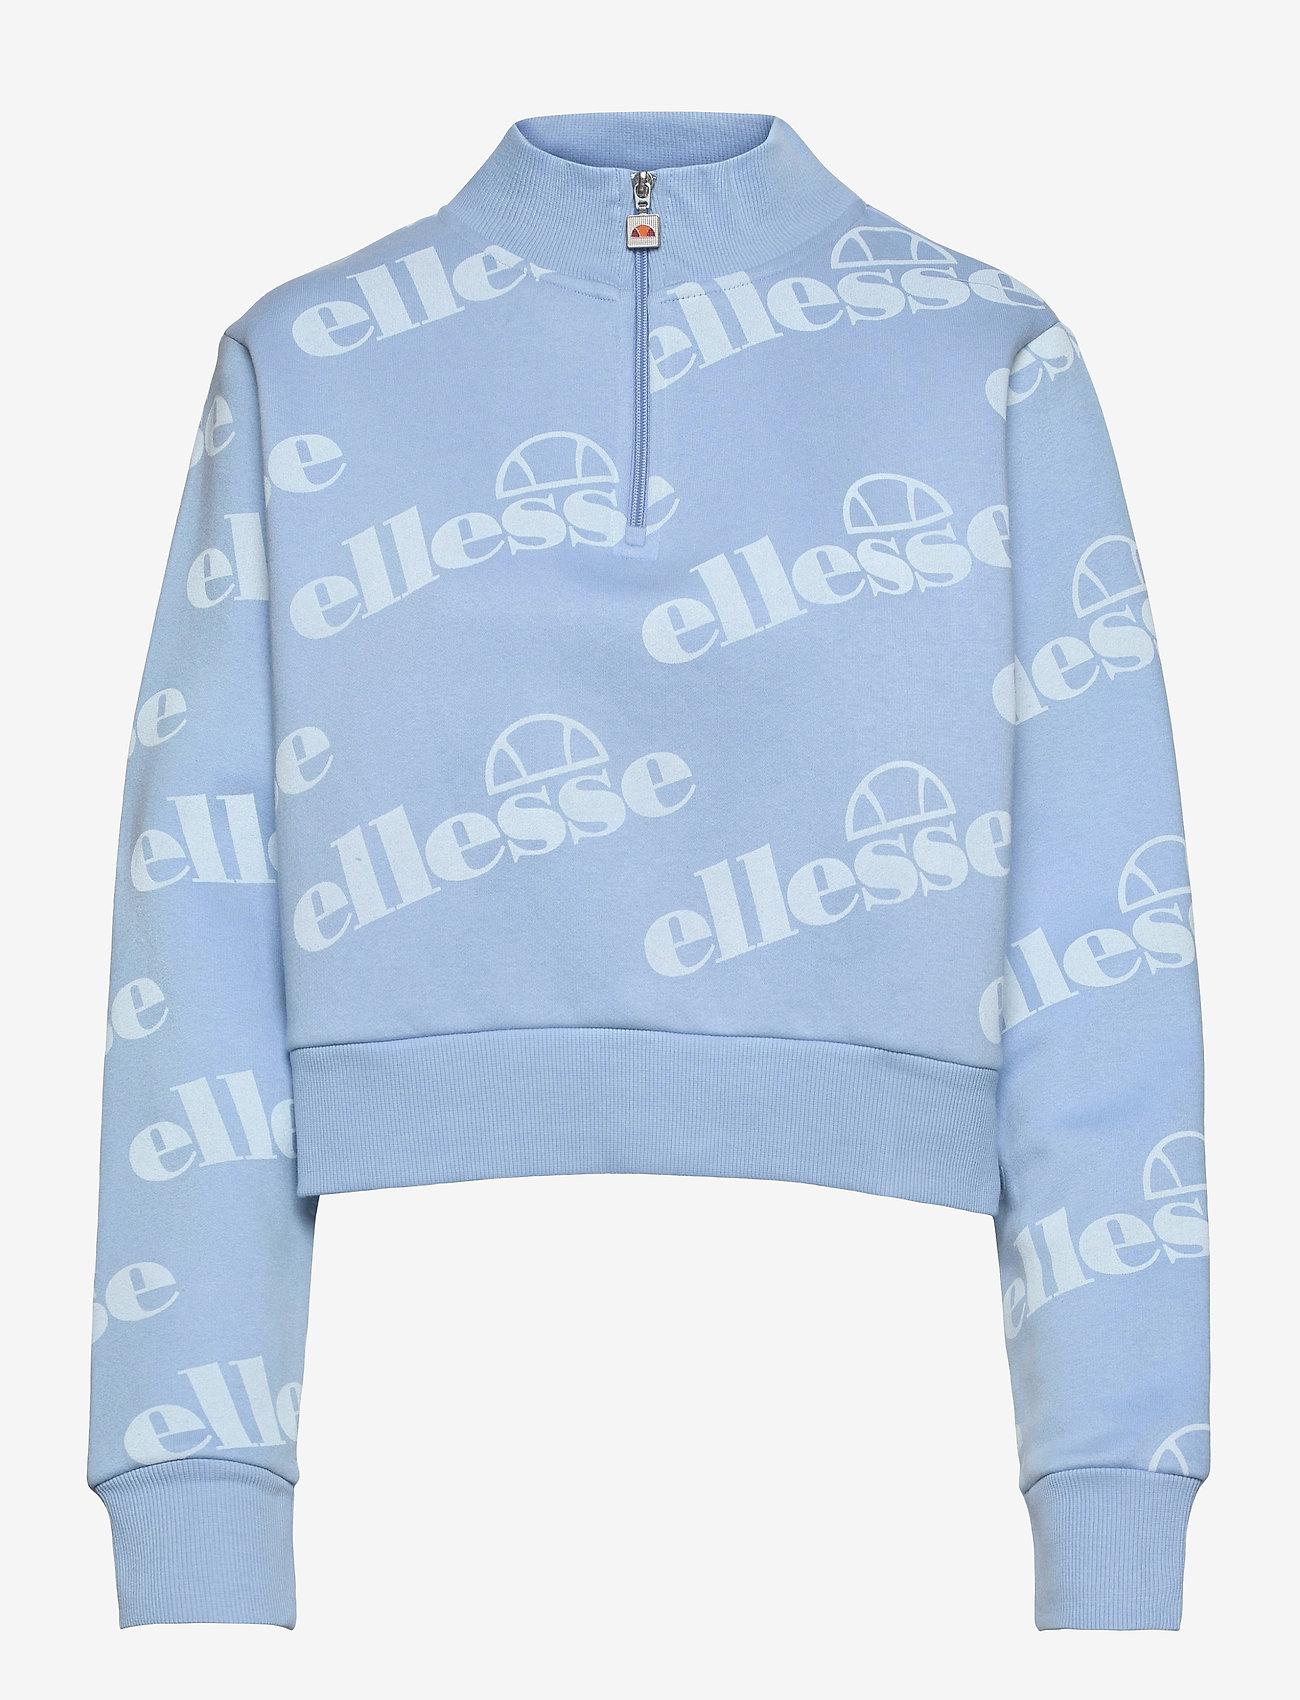 Ellesse - EL FULMIRE SWEATSHIRT - sweatshirts - light blue - 0